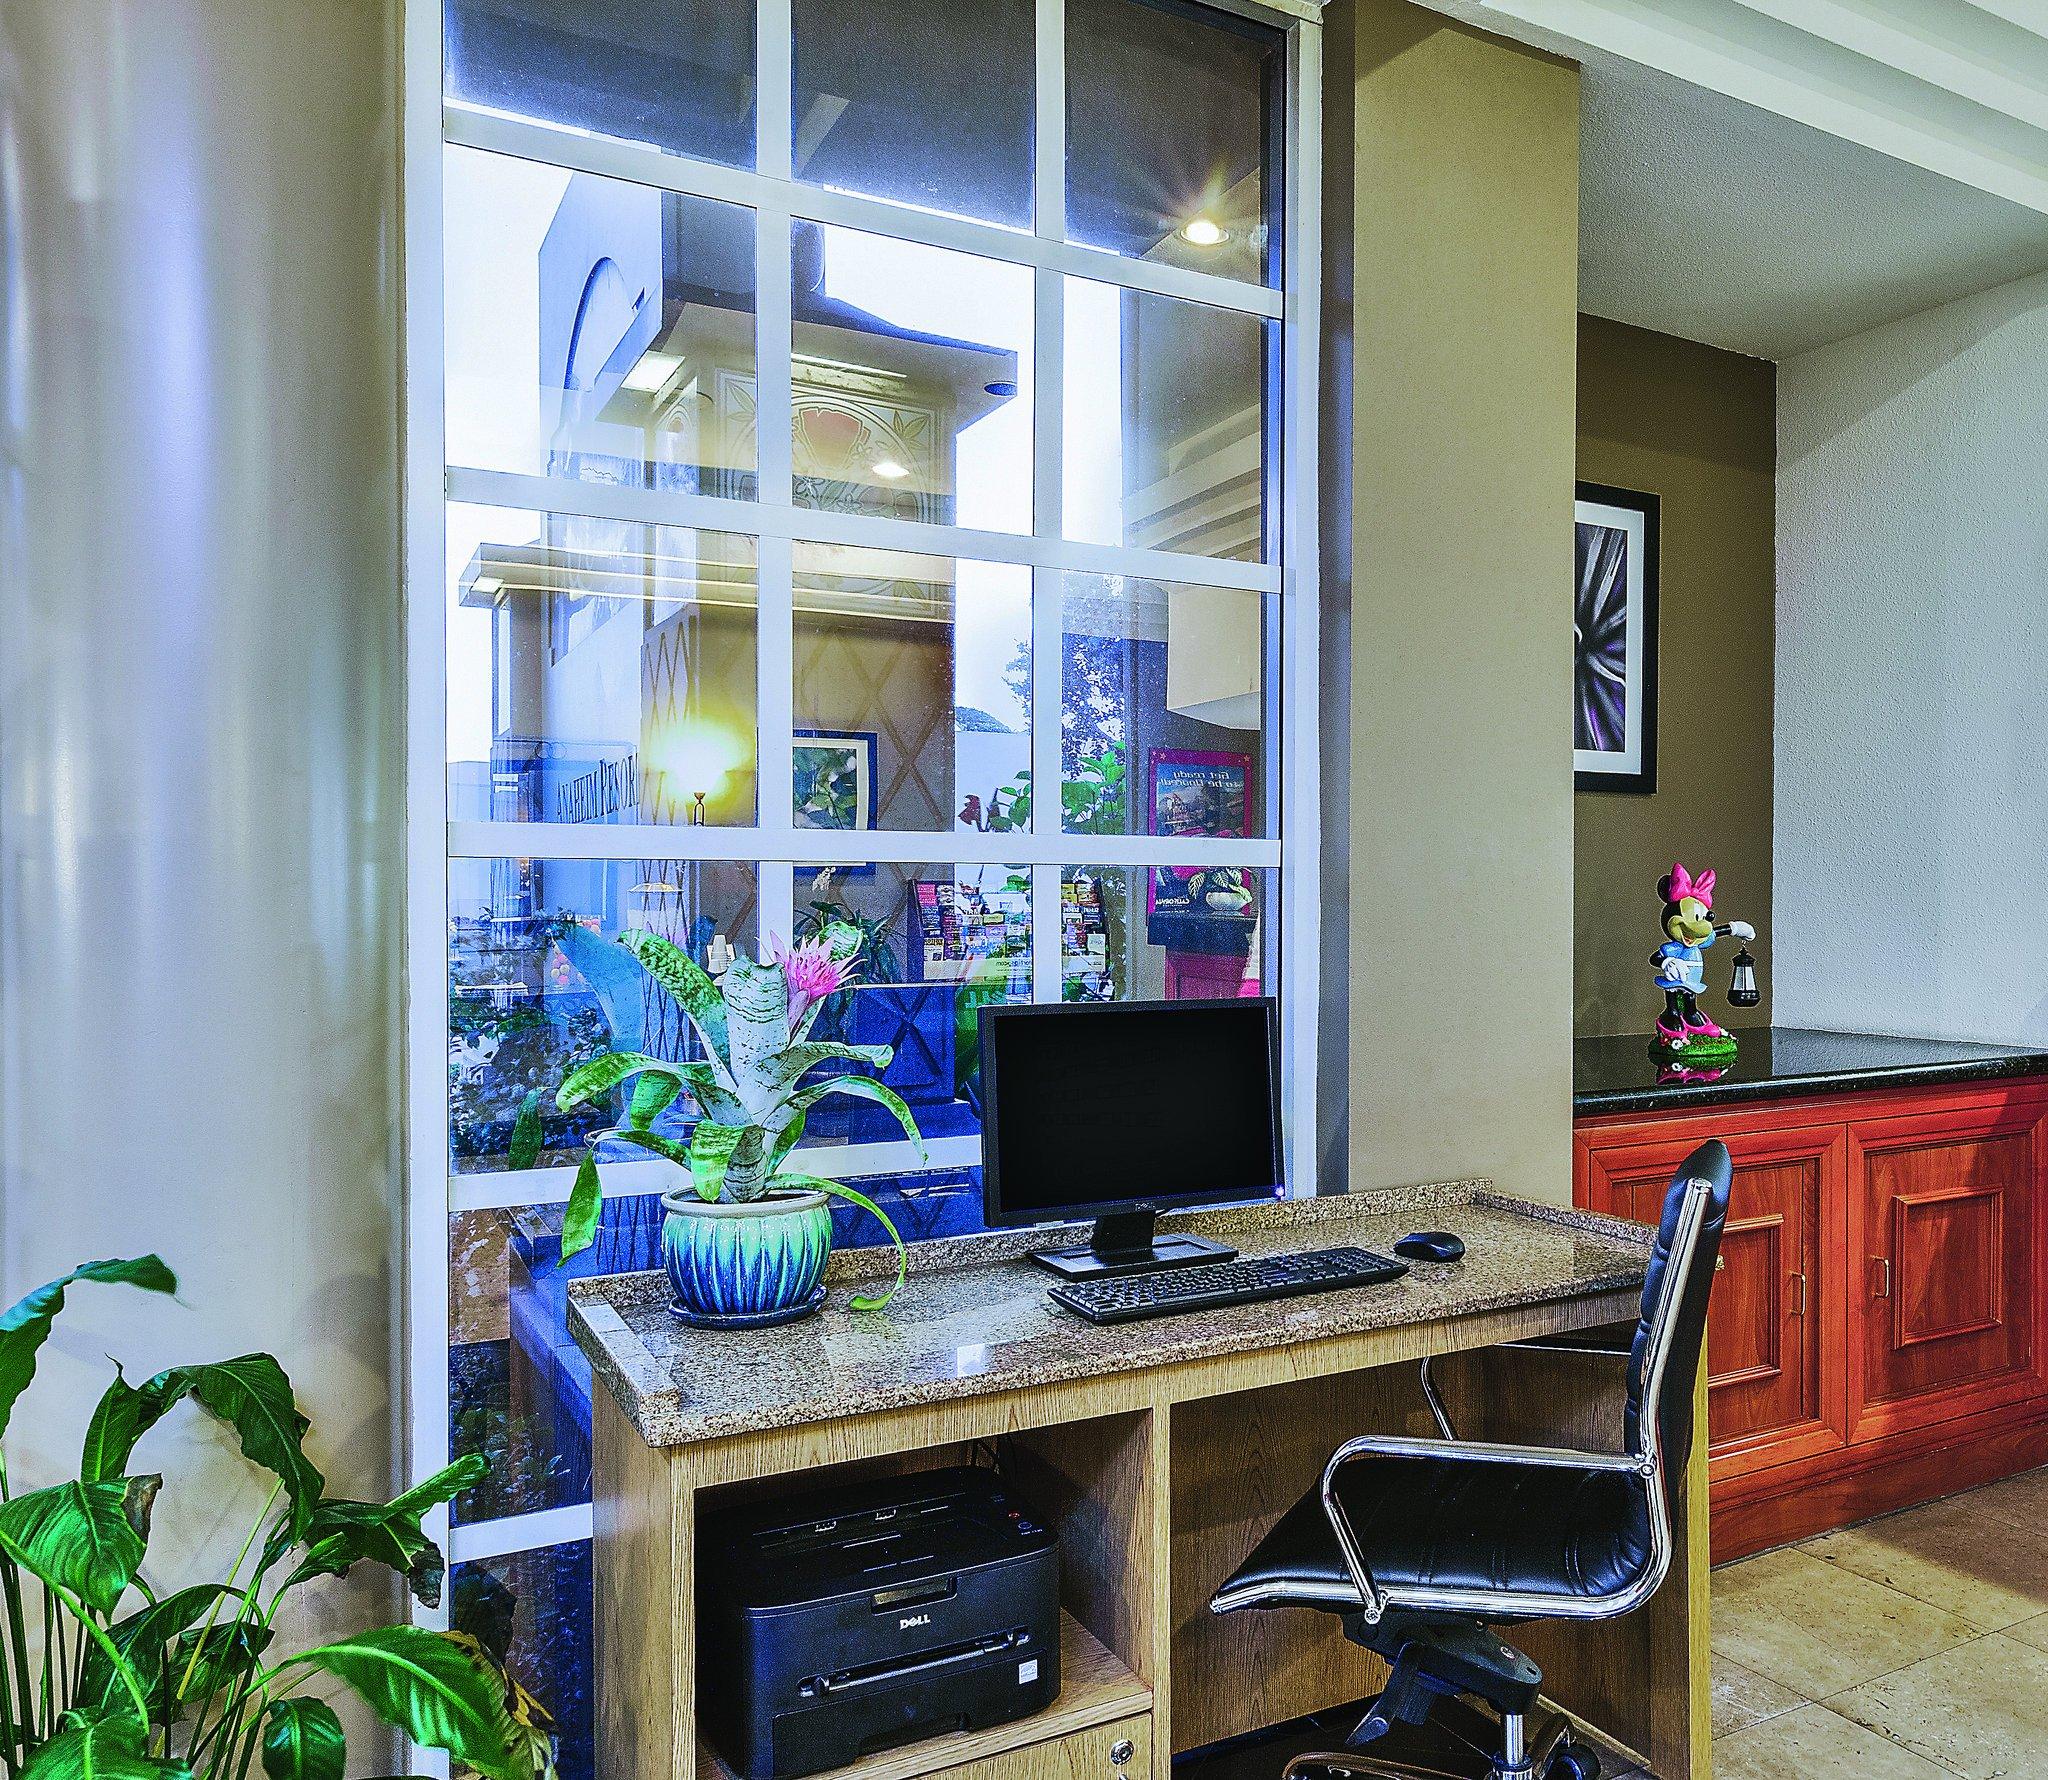 La Quinta Inn & Suites Anaheim